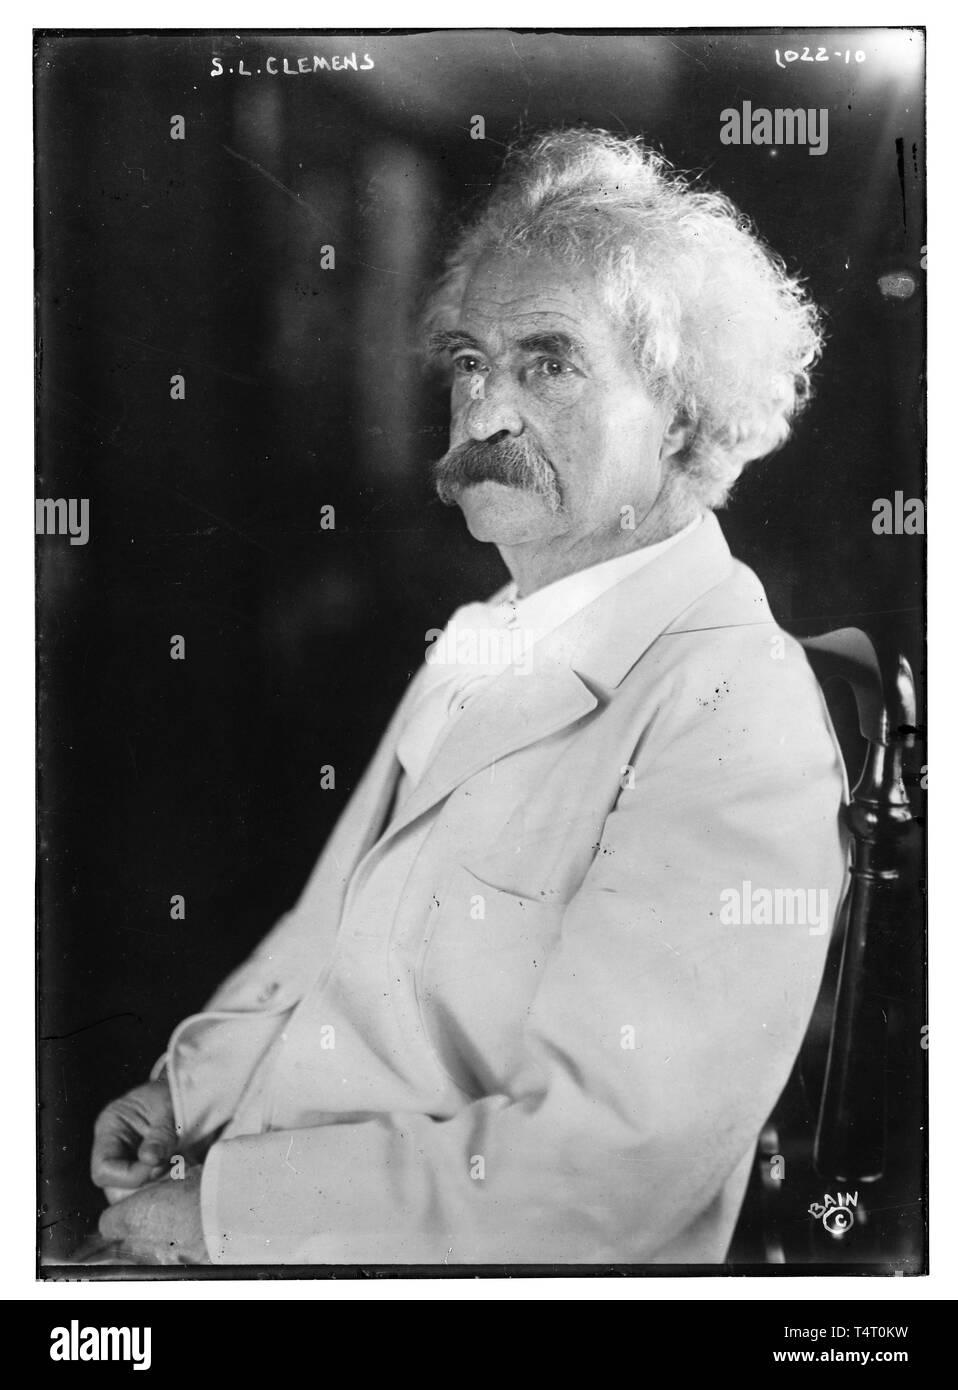 Mark Twain (1835-1910), portrait photograph, before 1910 Stock Photo